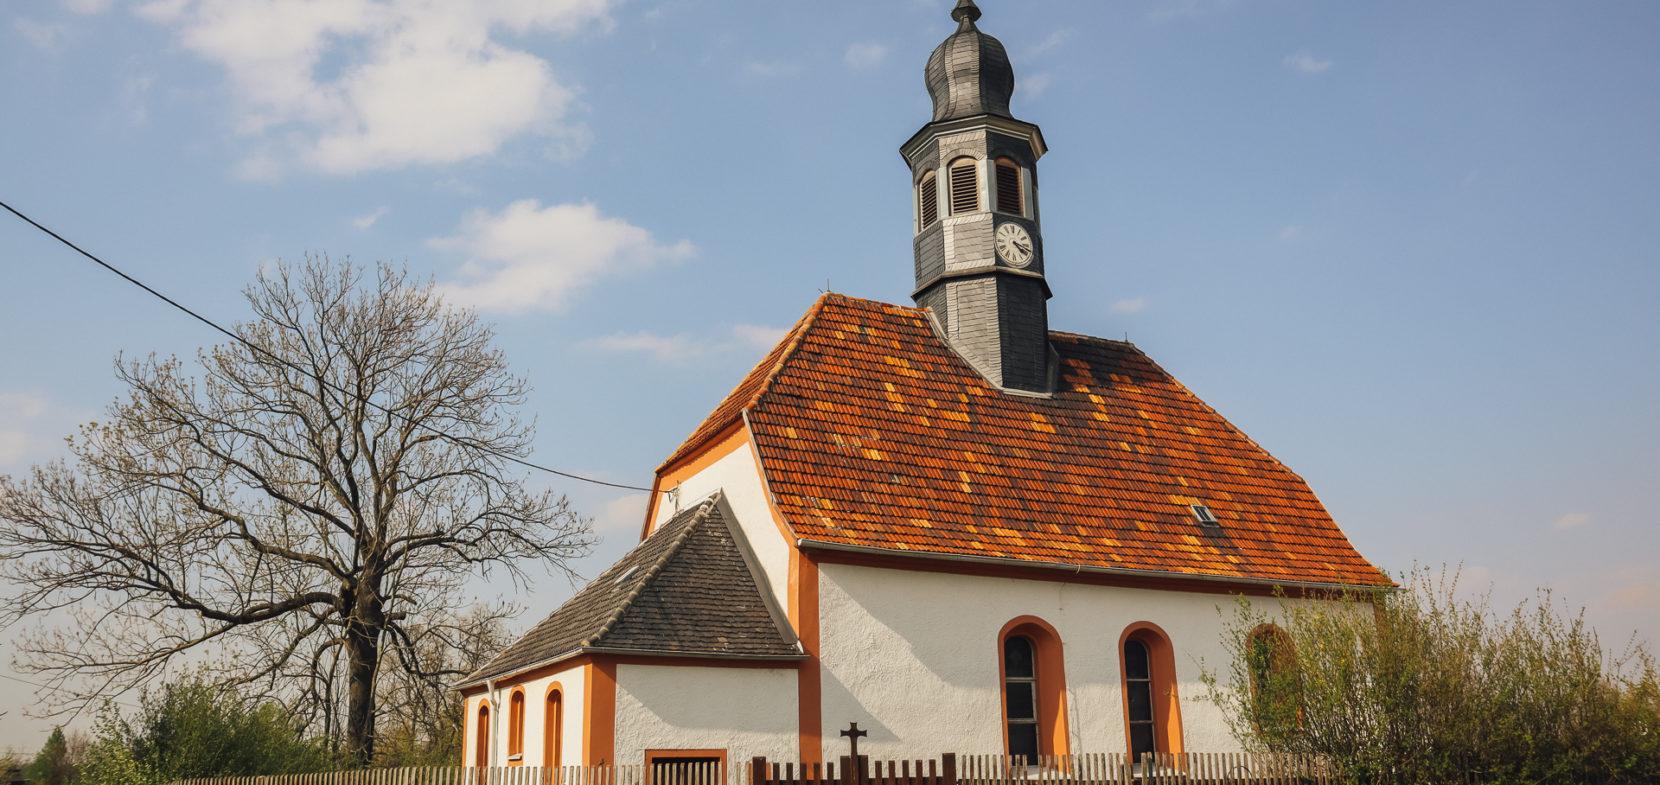 St. Nicolai Oberalbertsdorf